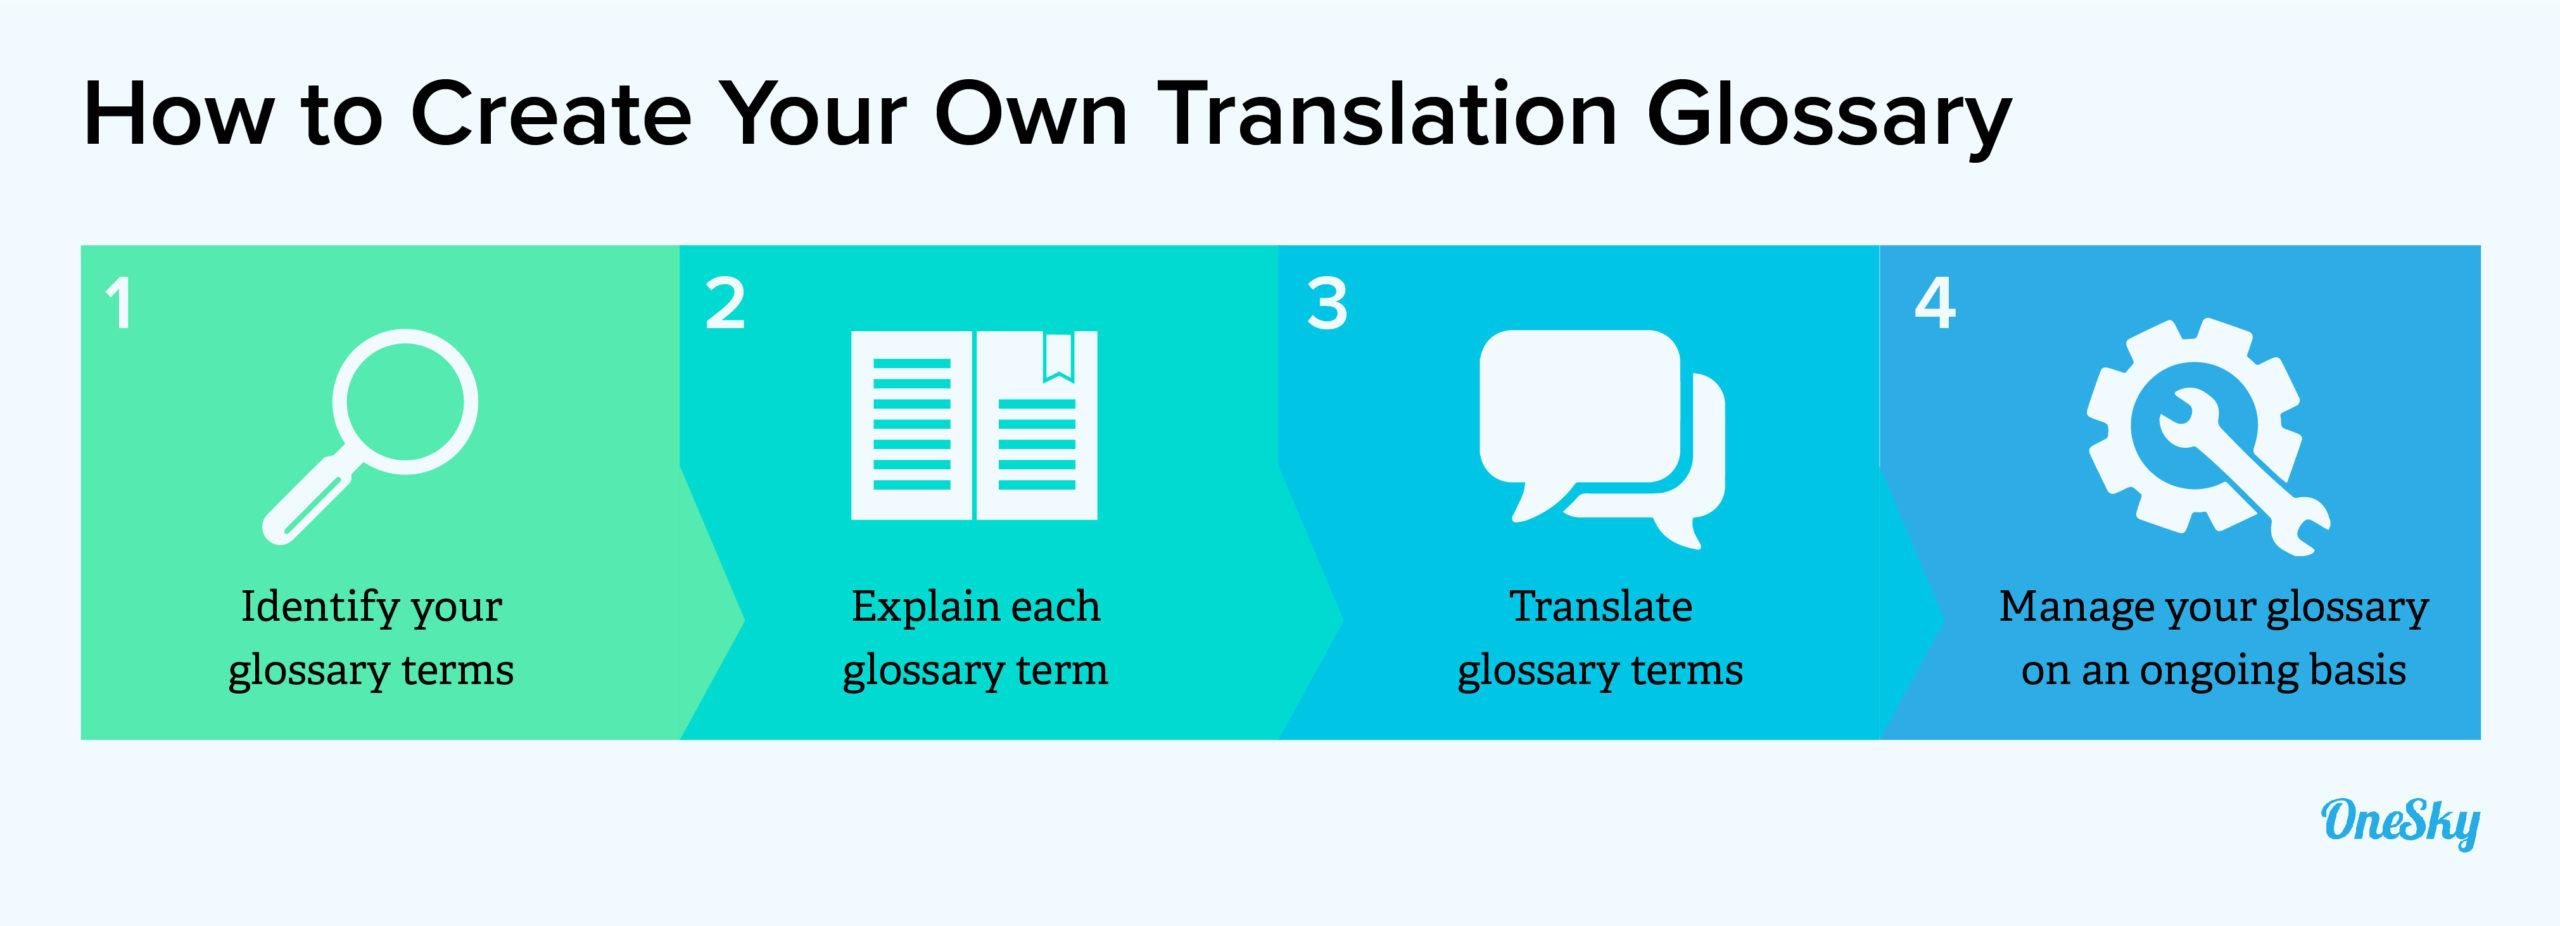 Keep Managing Your Translation Glossary